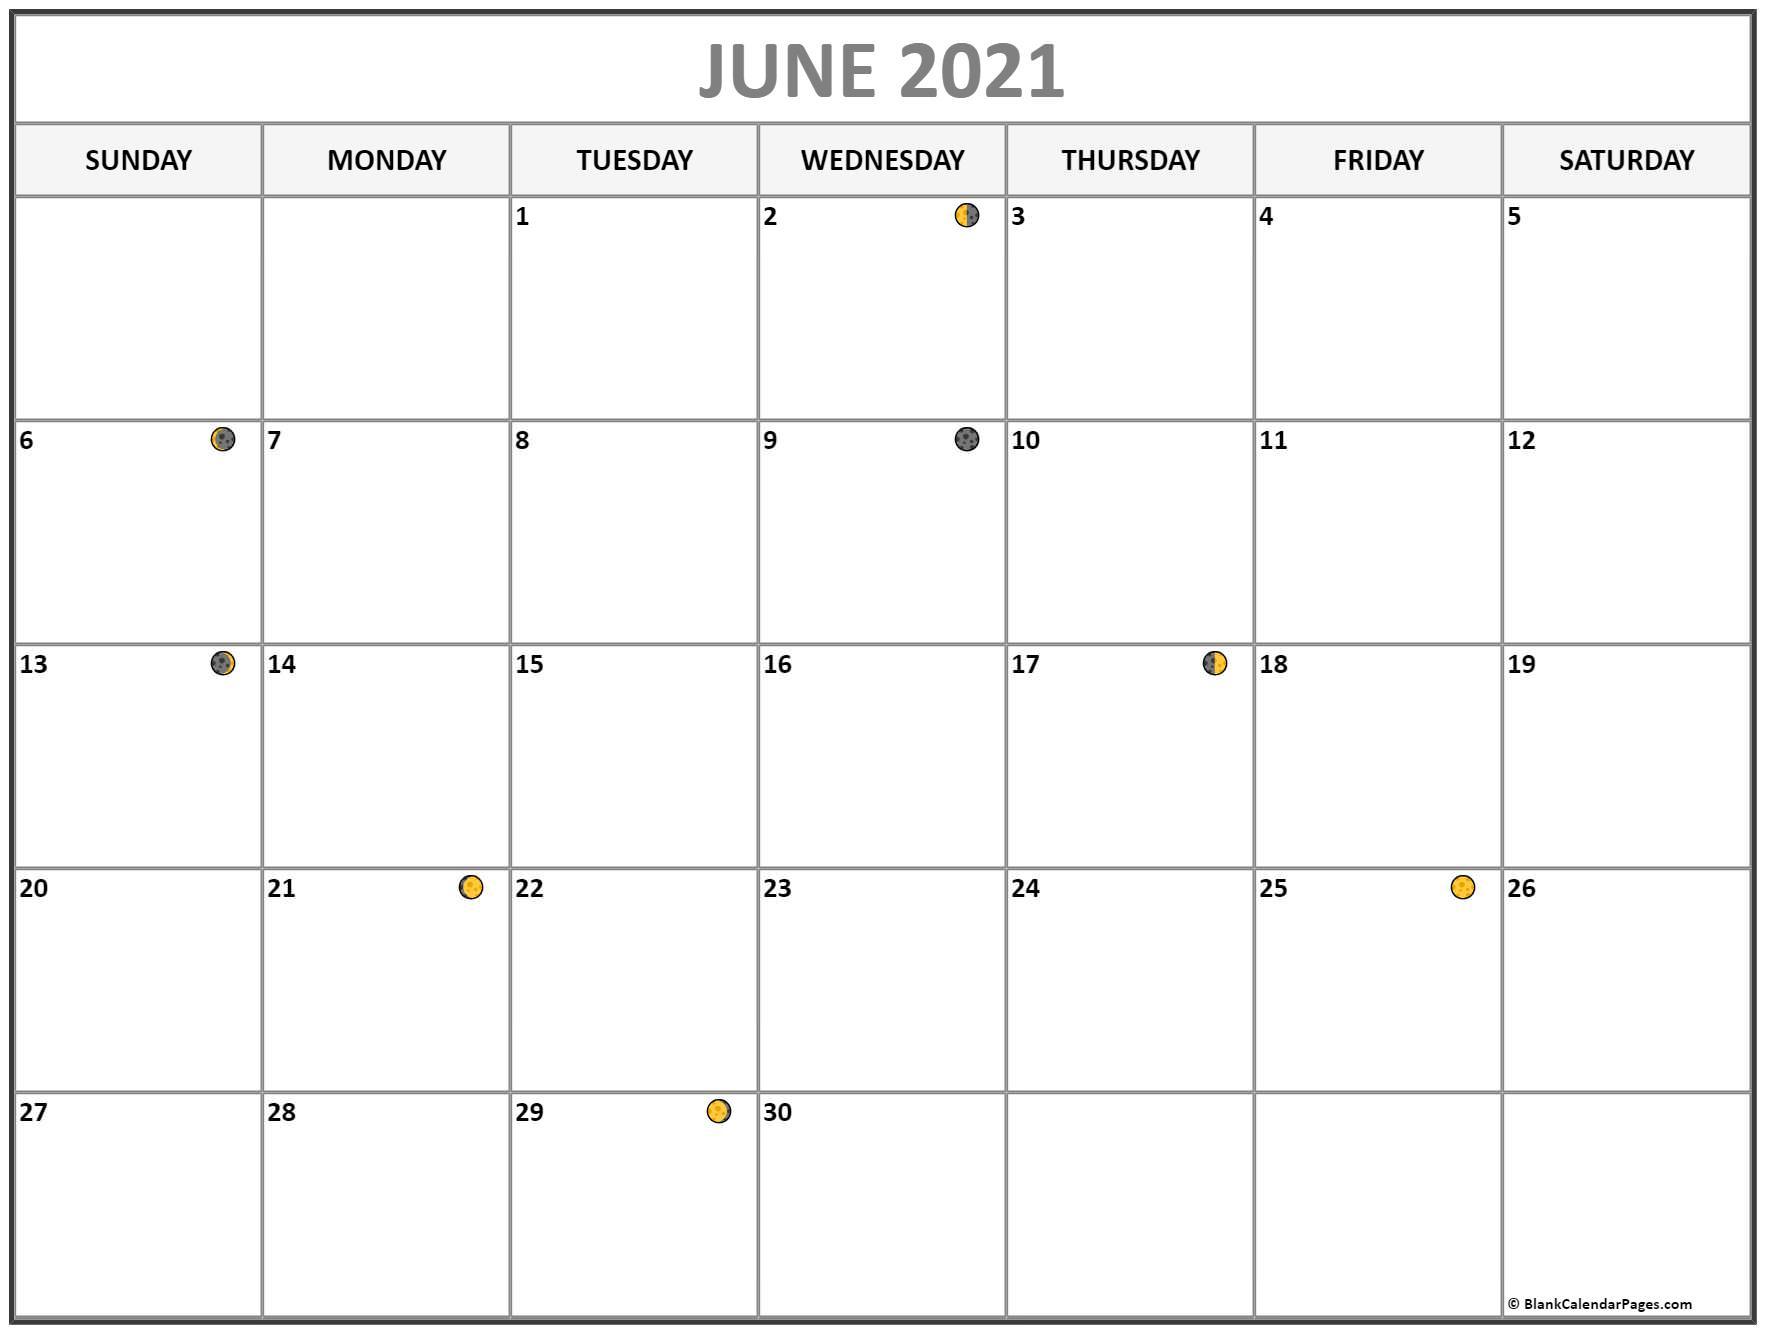 June 2021 Lunar Calendar | Moon Phase Calendar